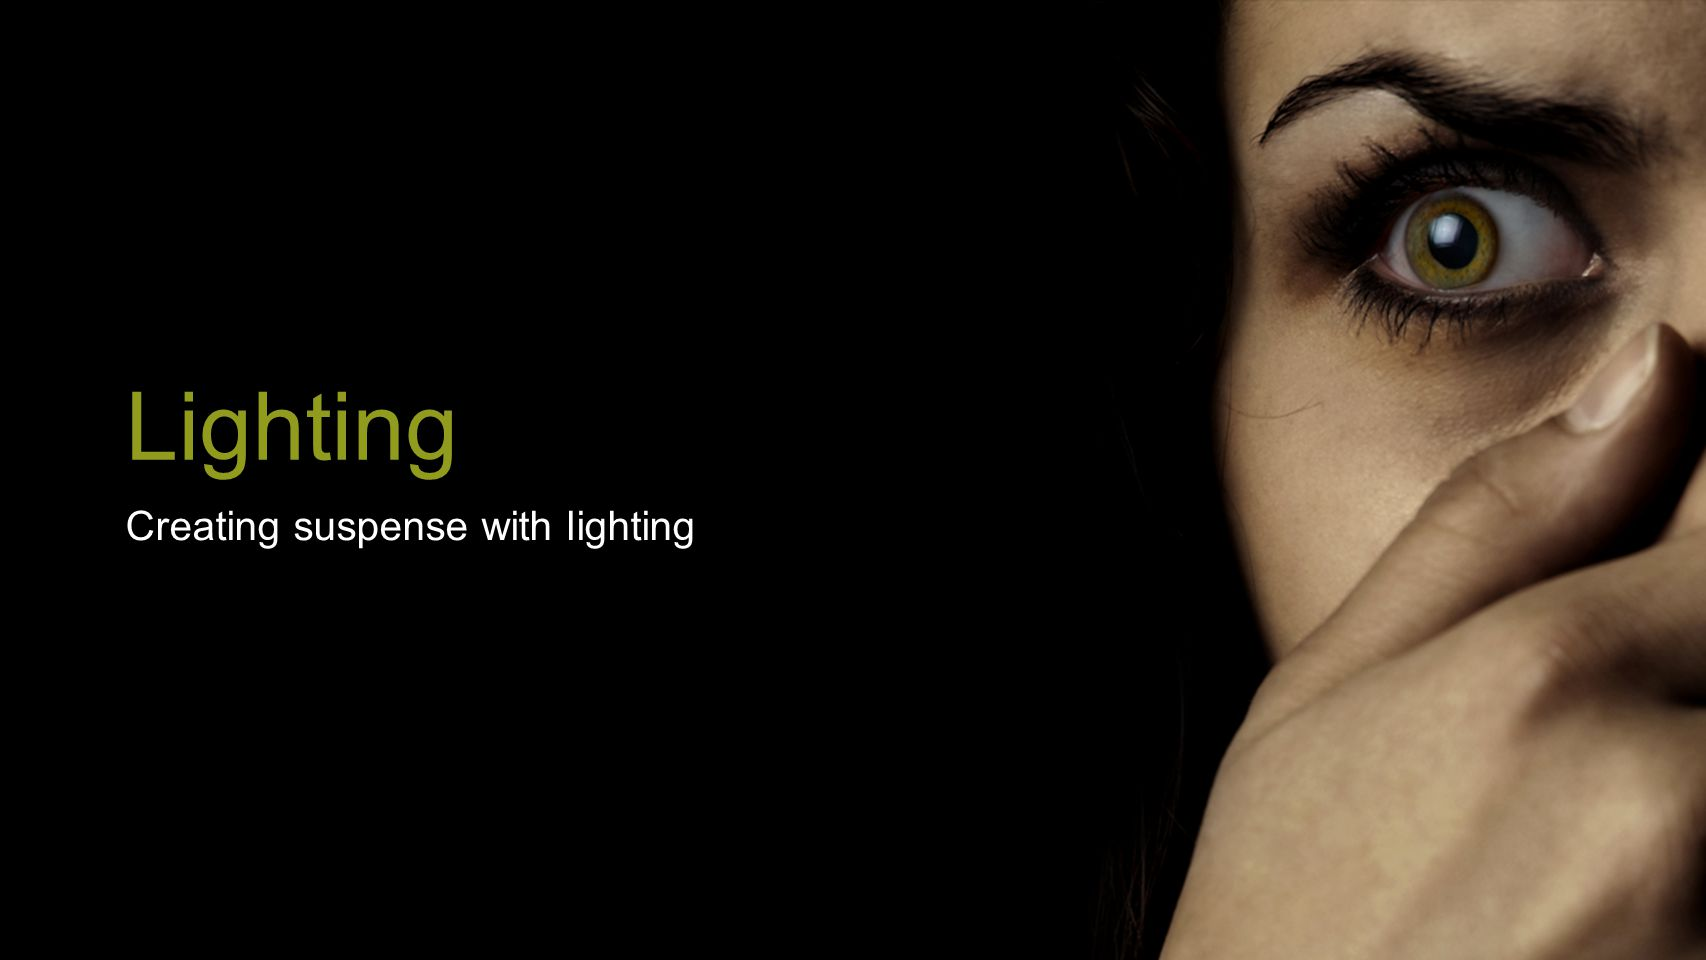 Lighting Creating suspense with lighting